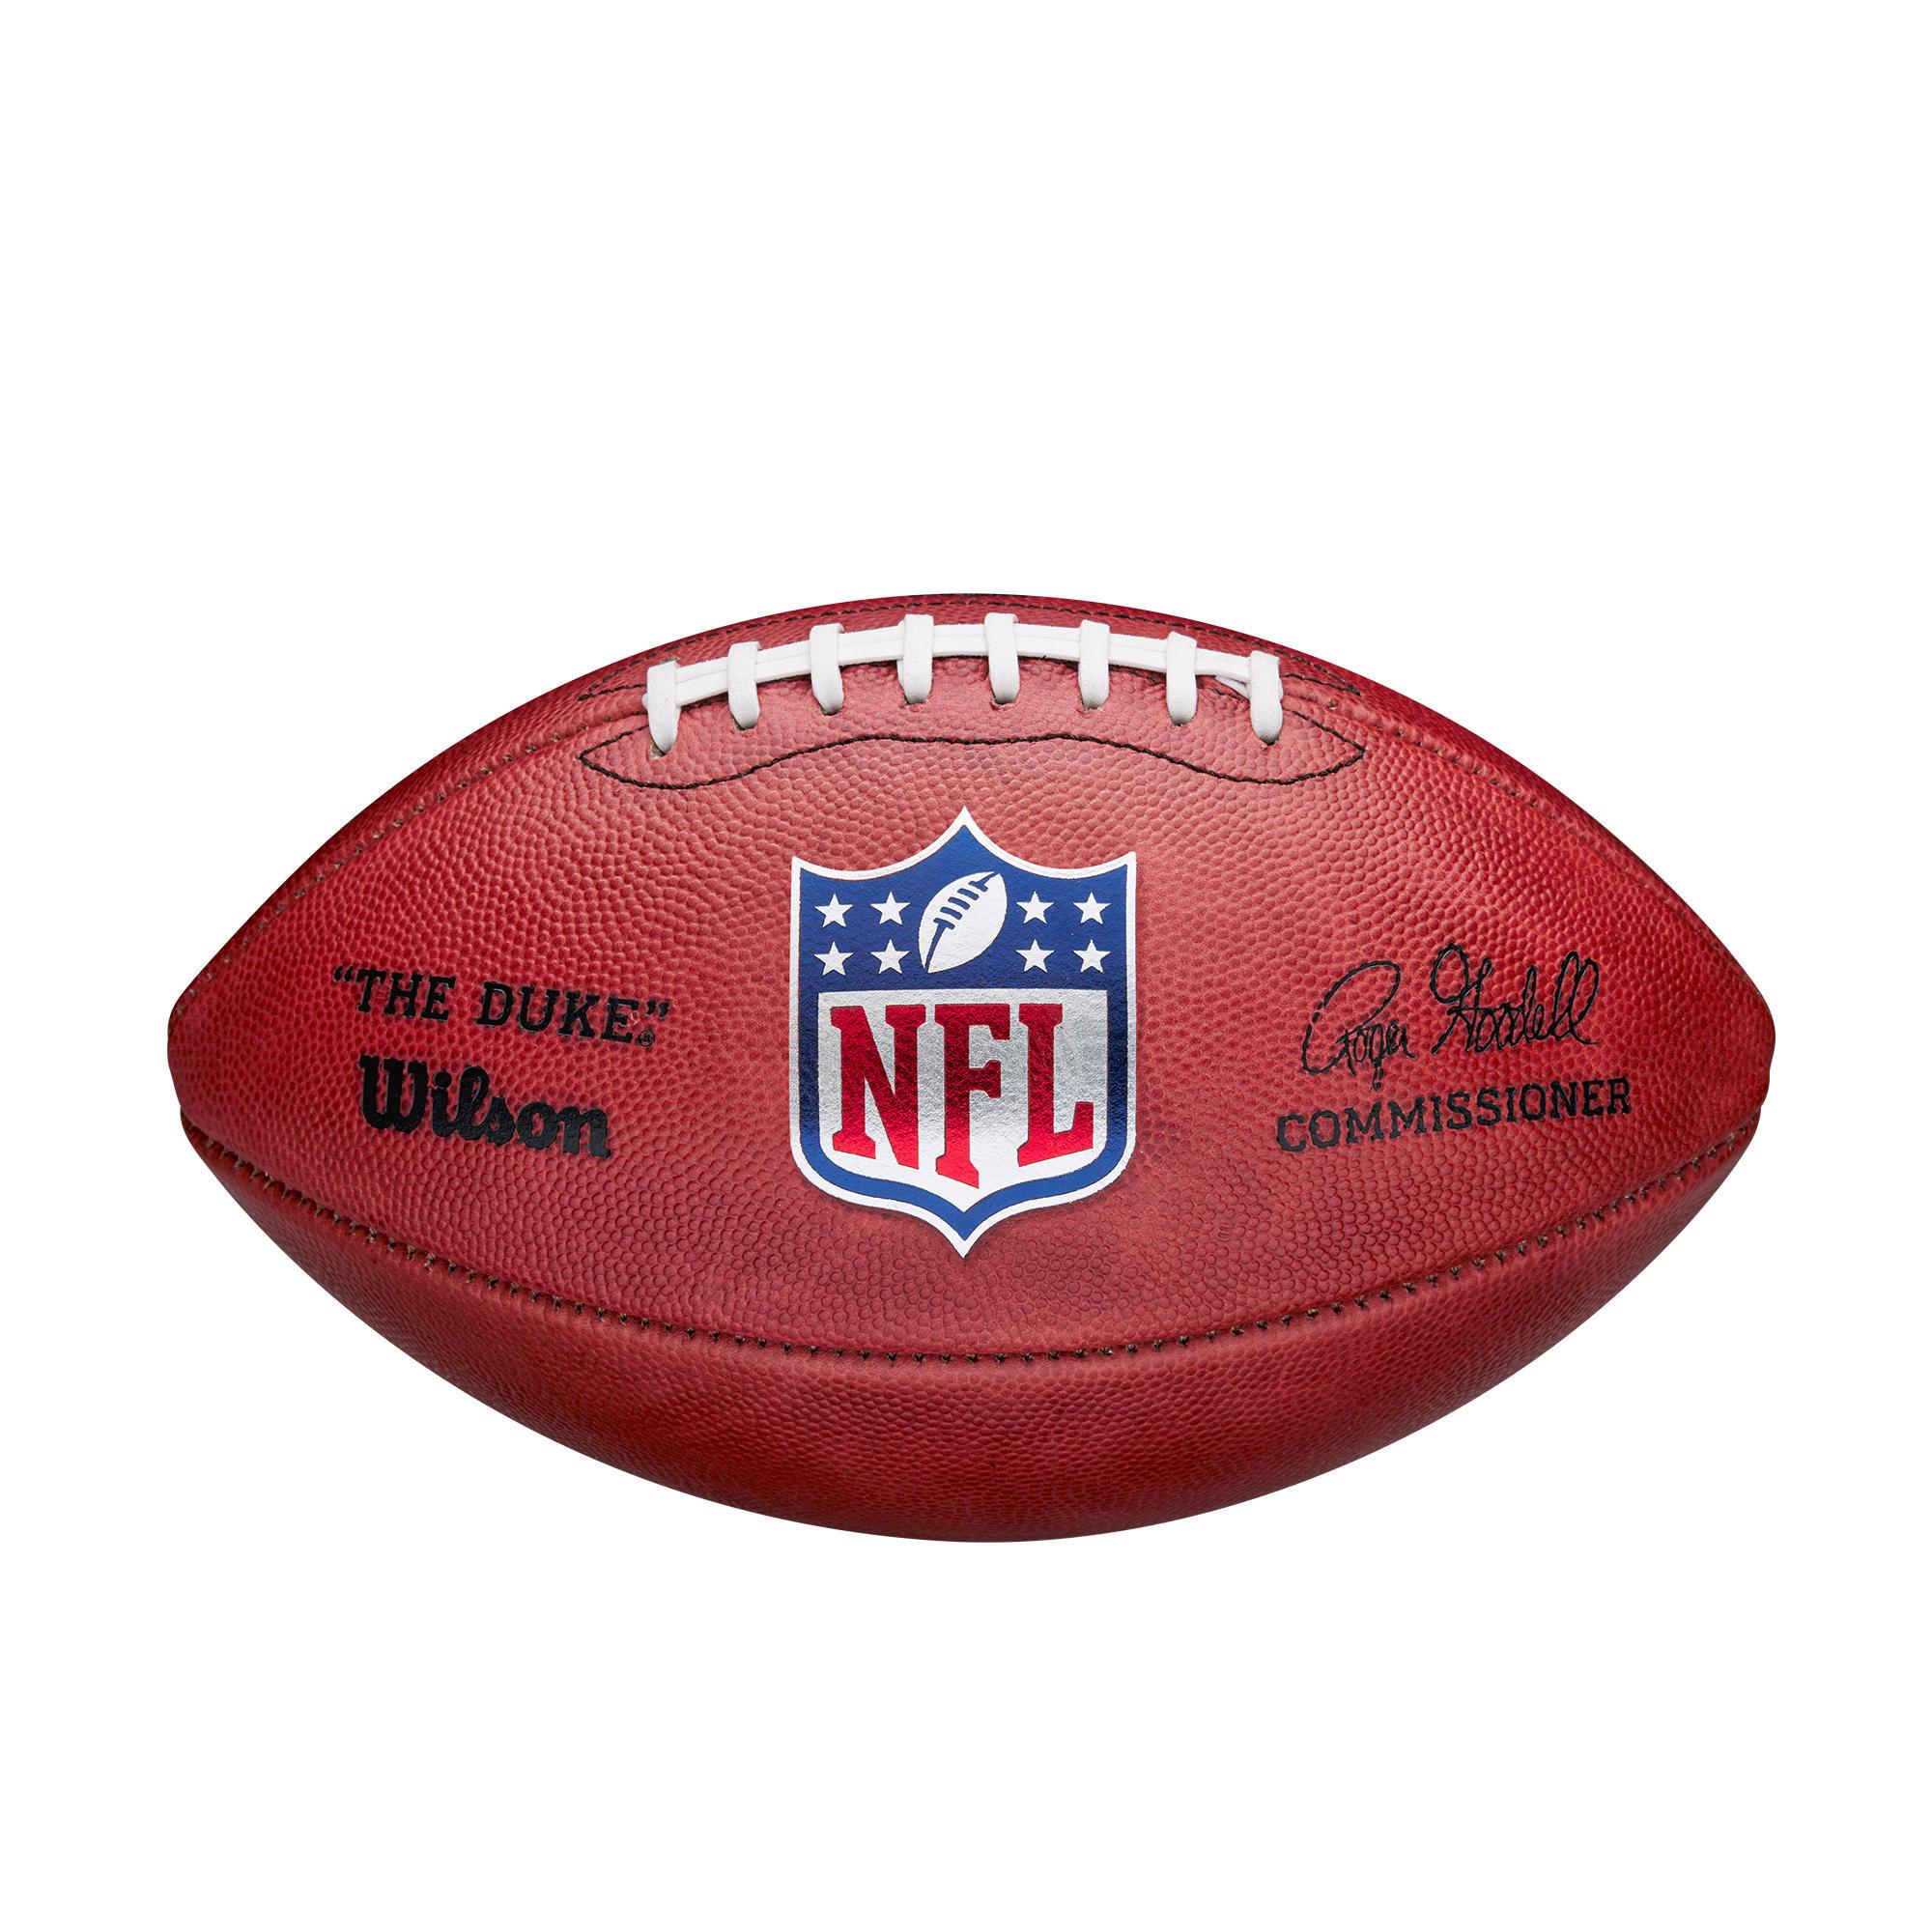 Minge NFL DUKE GAME